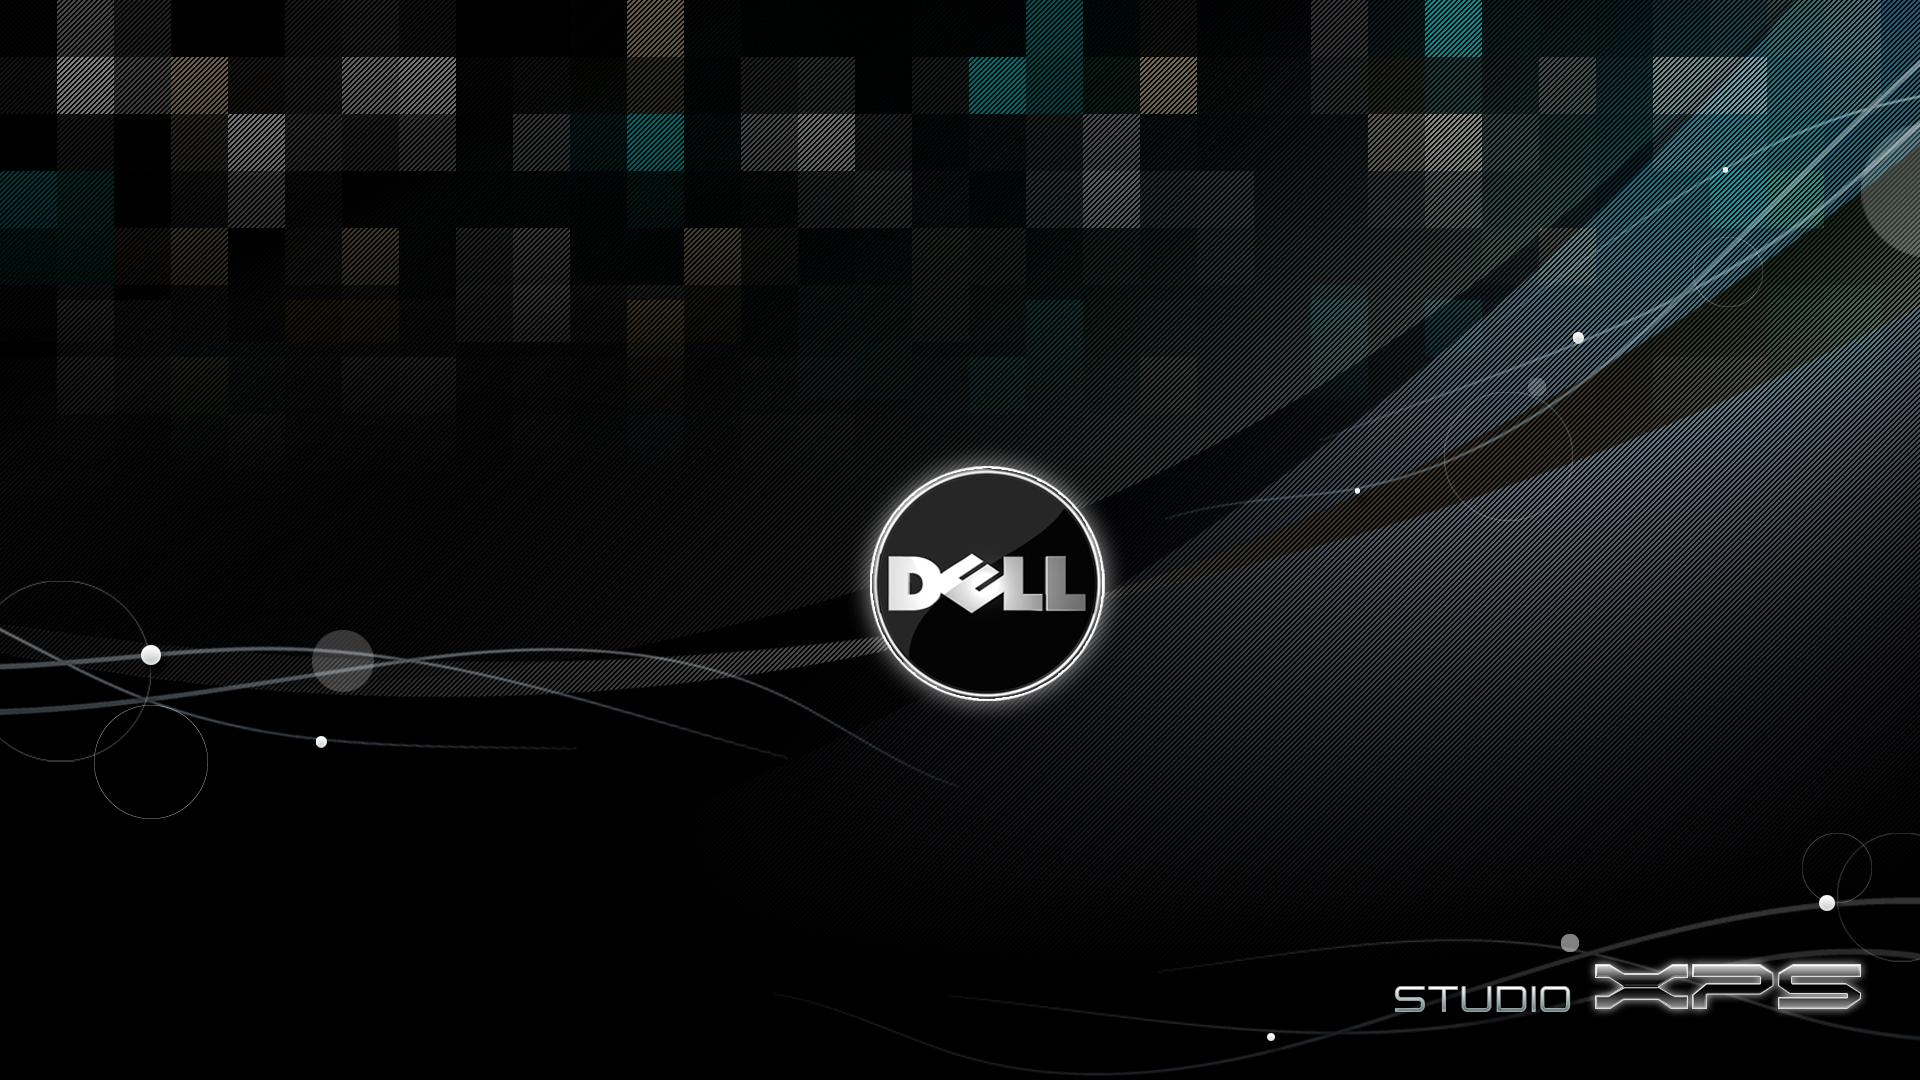 Dell Xps Wallpaper